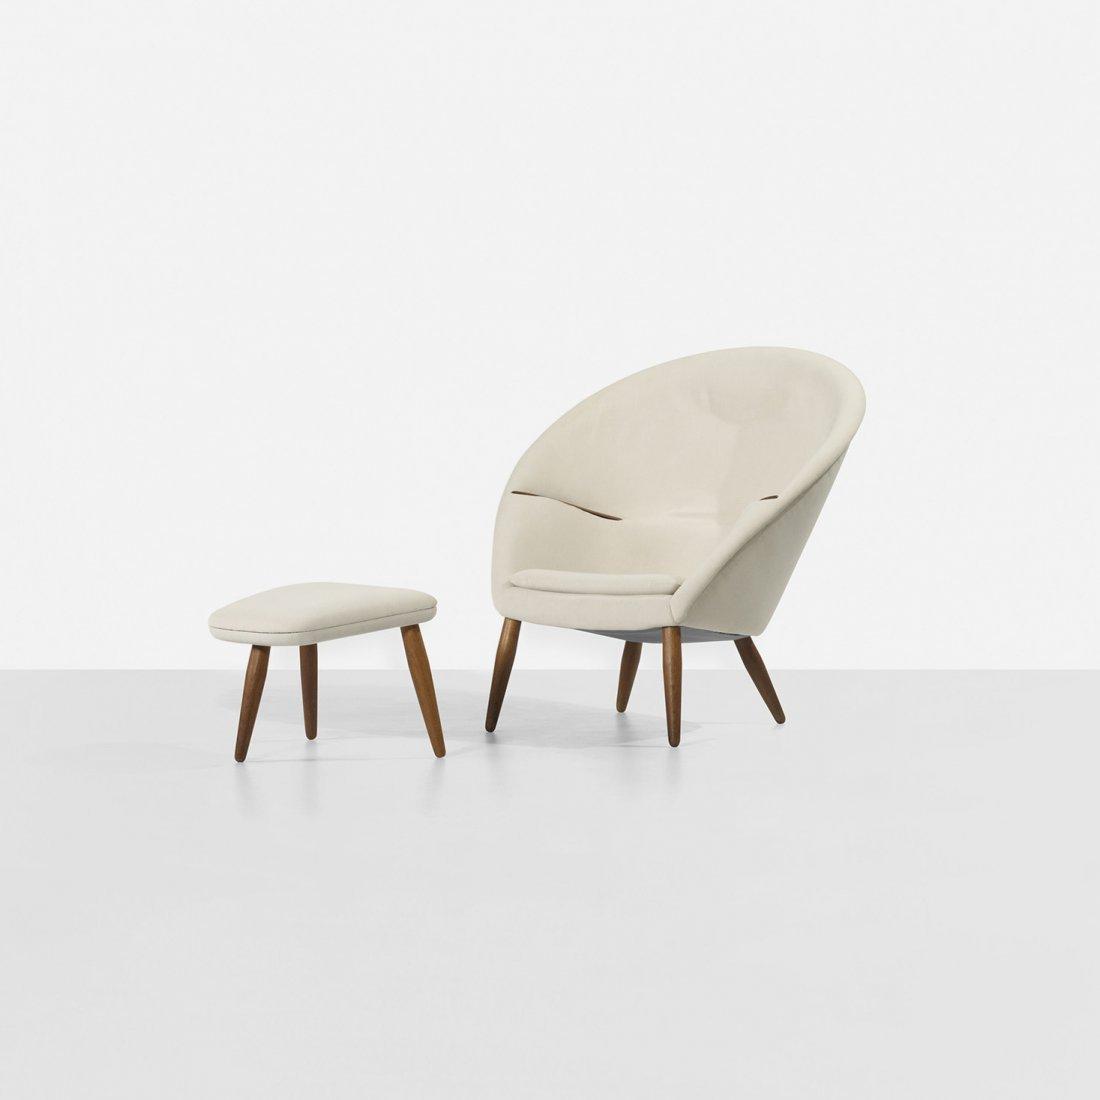 102: Nanna Ditzel rare lounge chair and ottoman